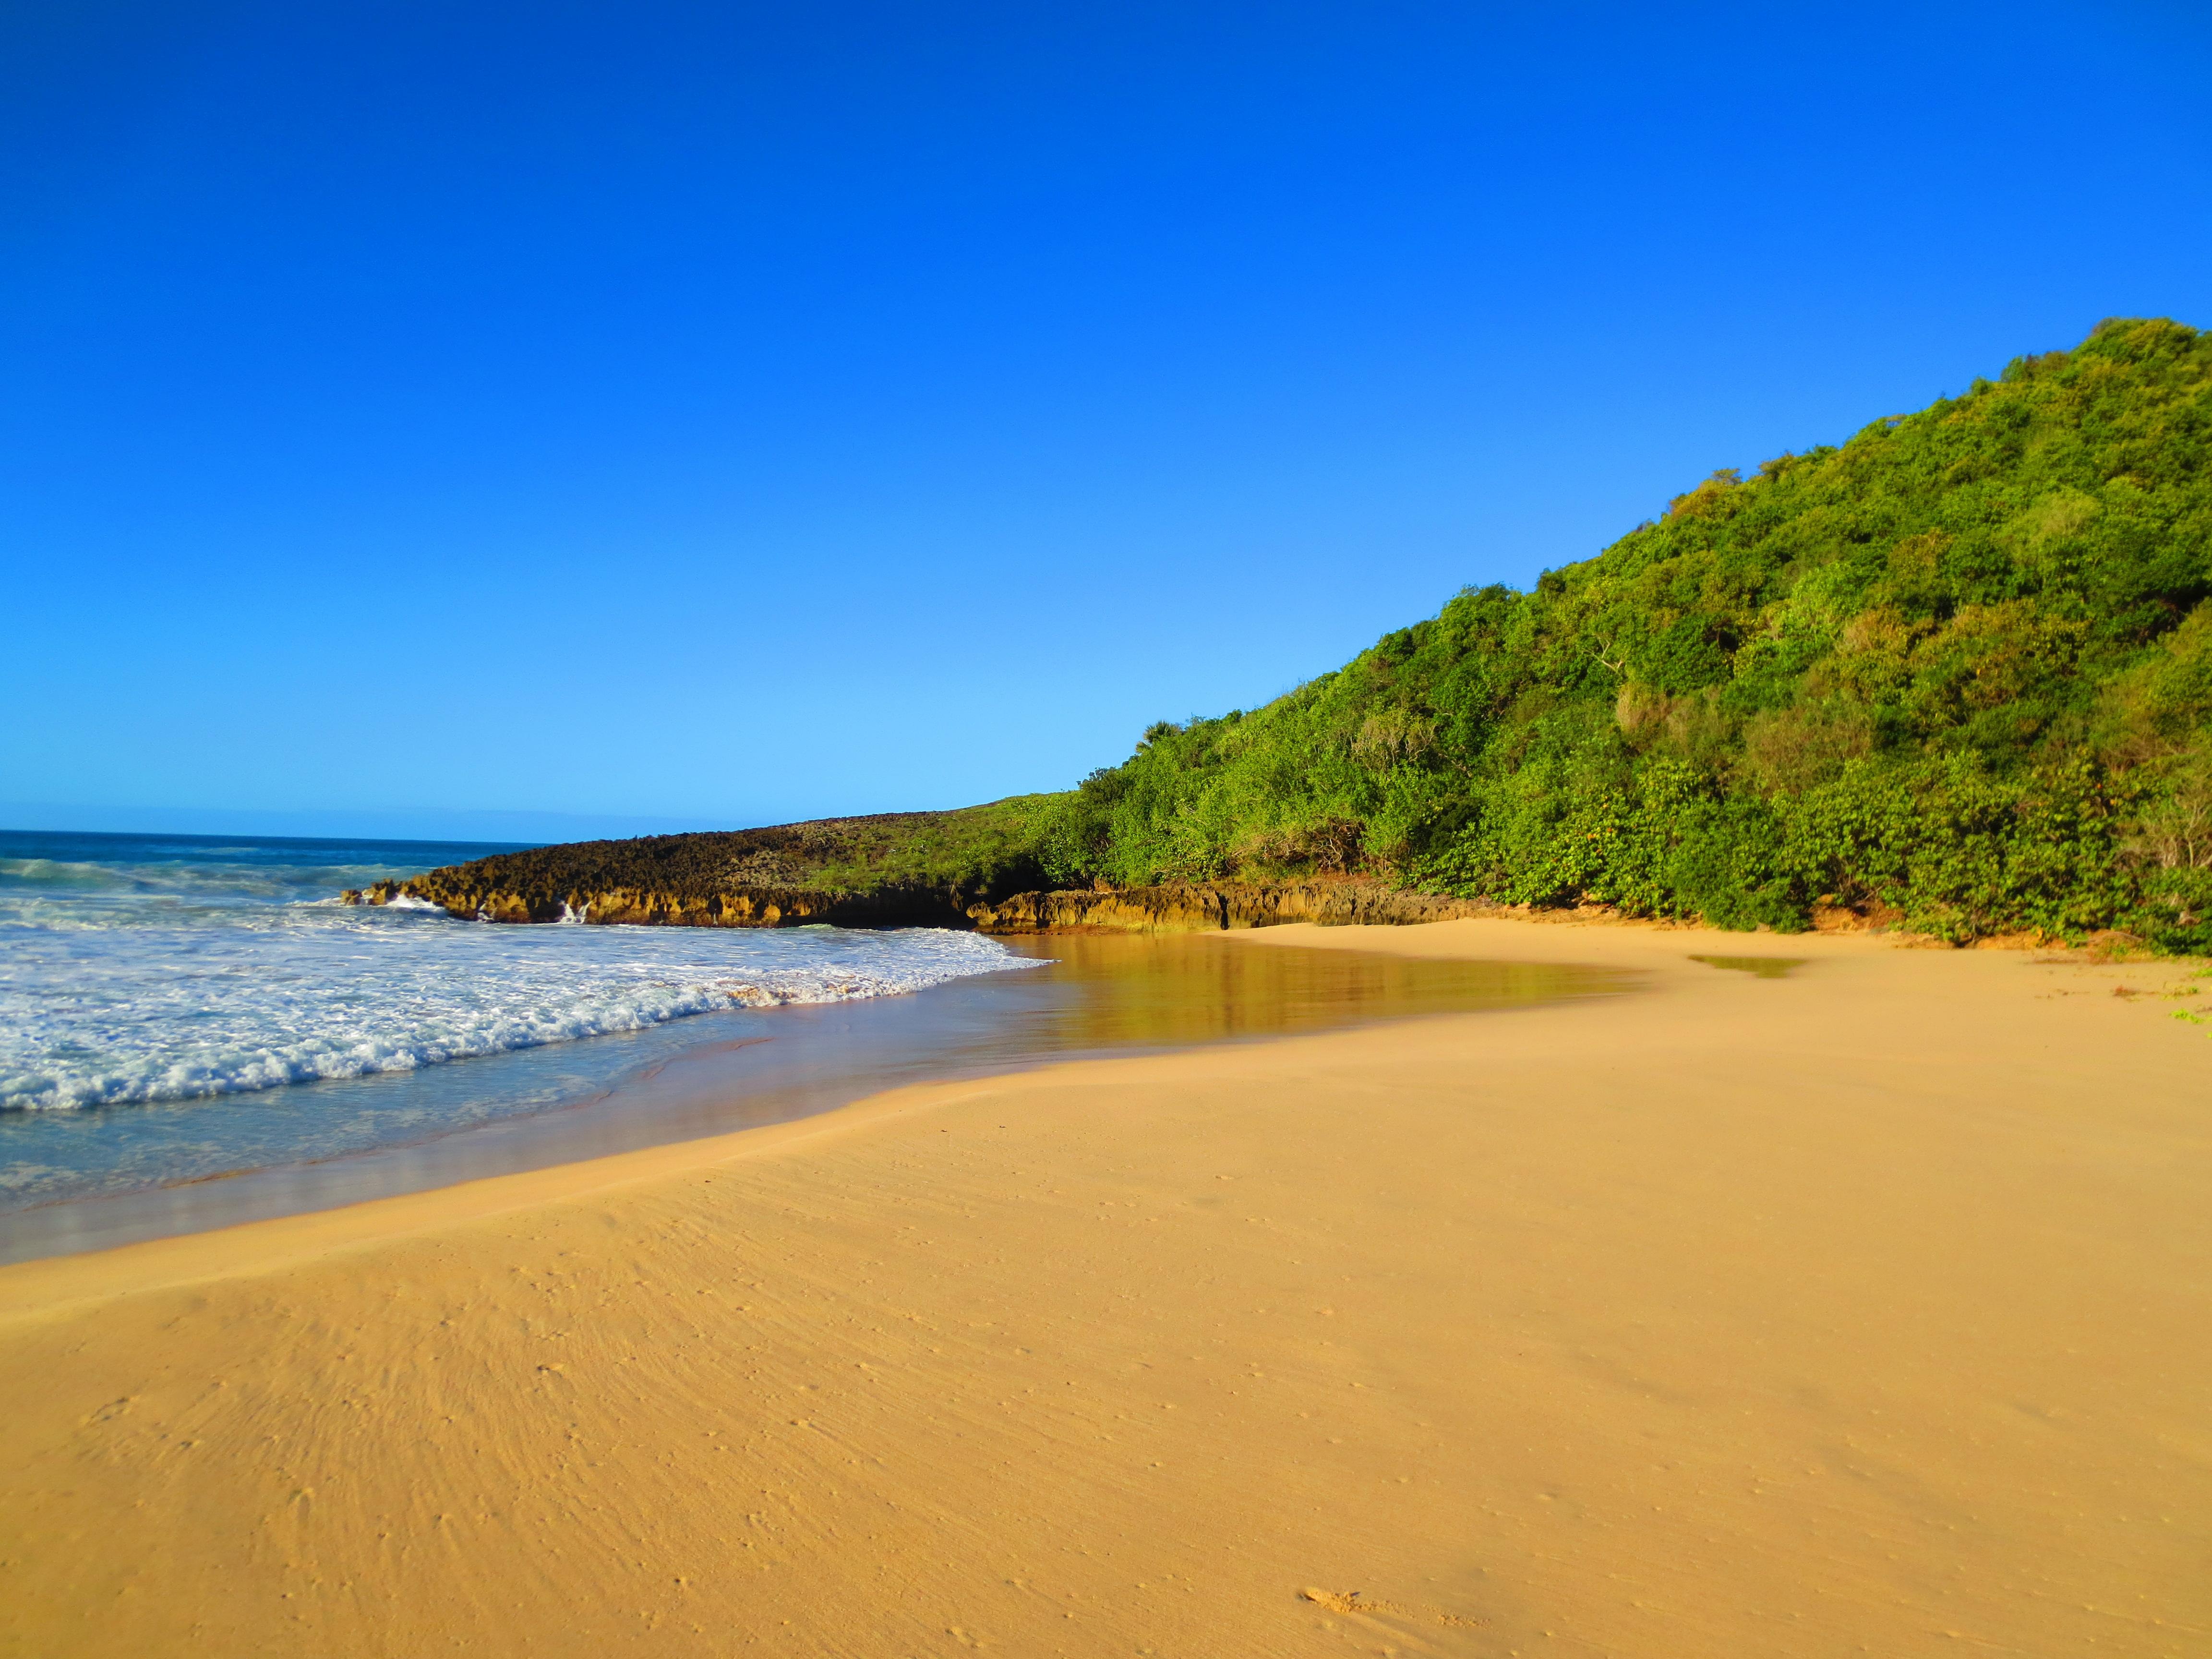 Quiet beach photo